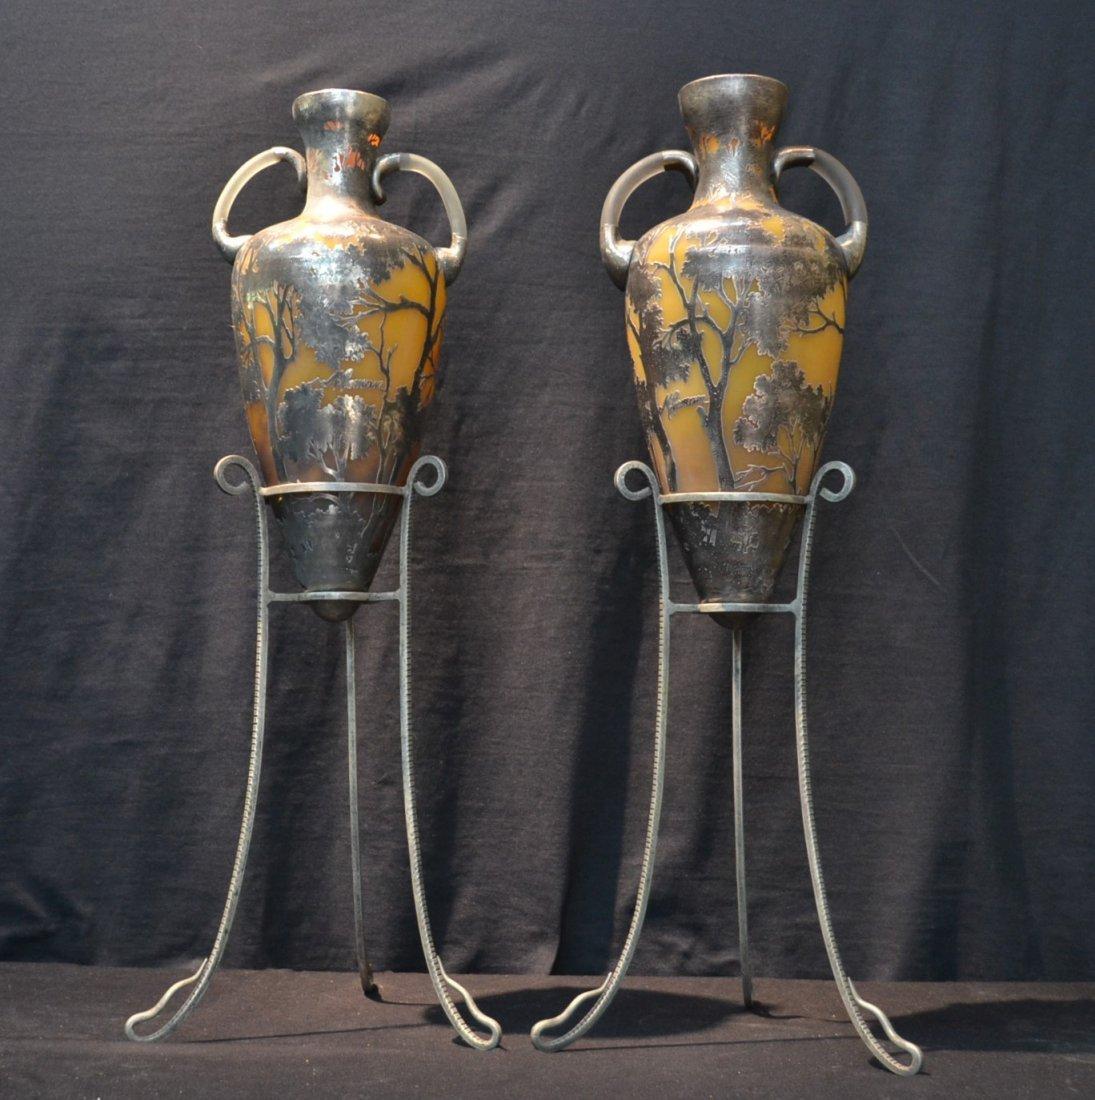 (Pr) SCENIC SILVER OVERLAY ORANGE CAMEO GLASS